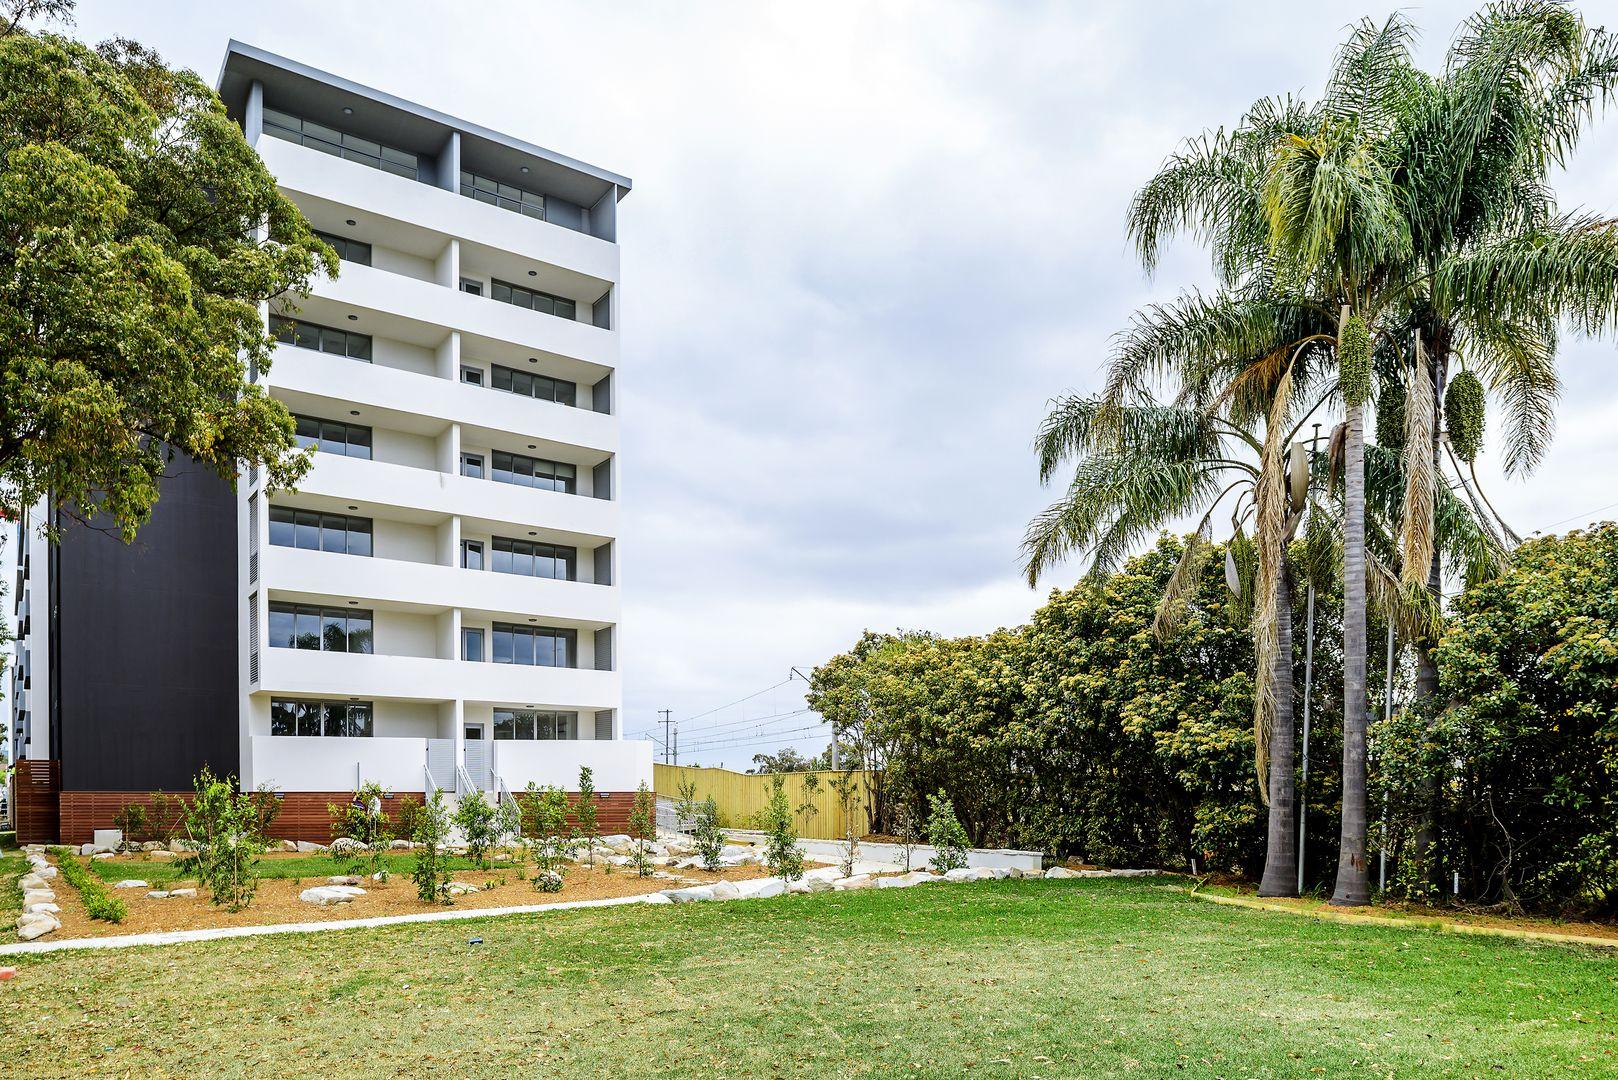 81/3-17 Queen Street, Campbelltown NSW 2560, Image 0